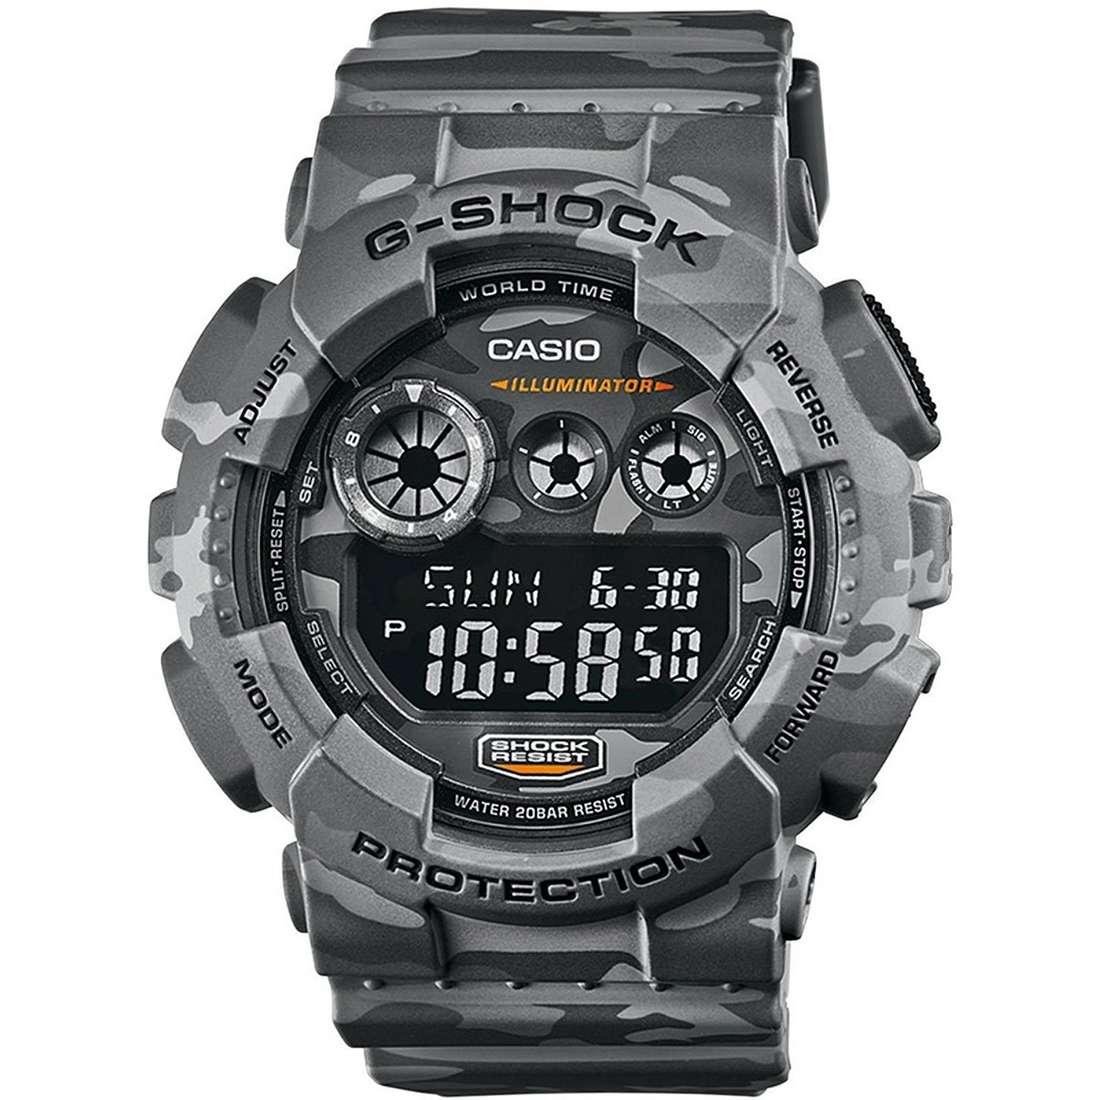 montre multifonction homme Casio G-SHOCK GD-120CM-8ER